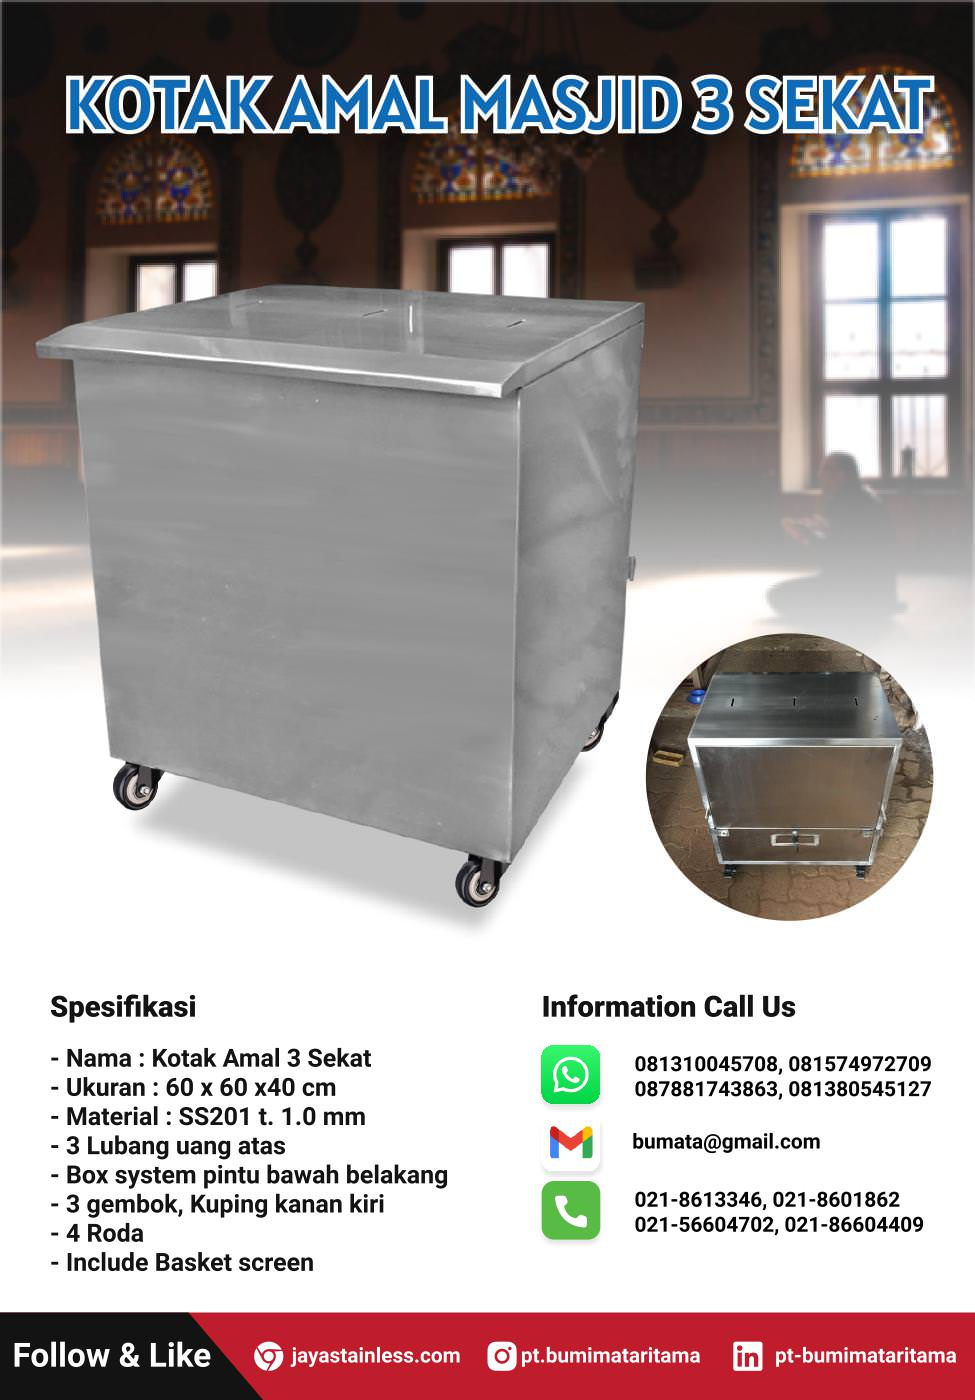 Kotak Amal Masjid 3 Sekat